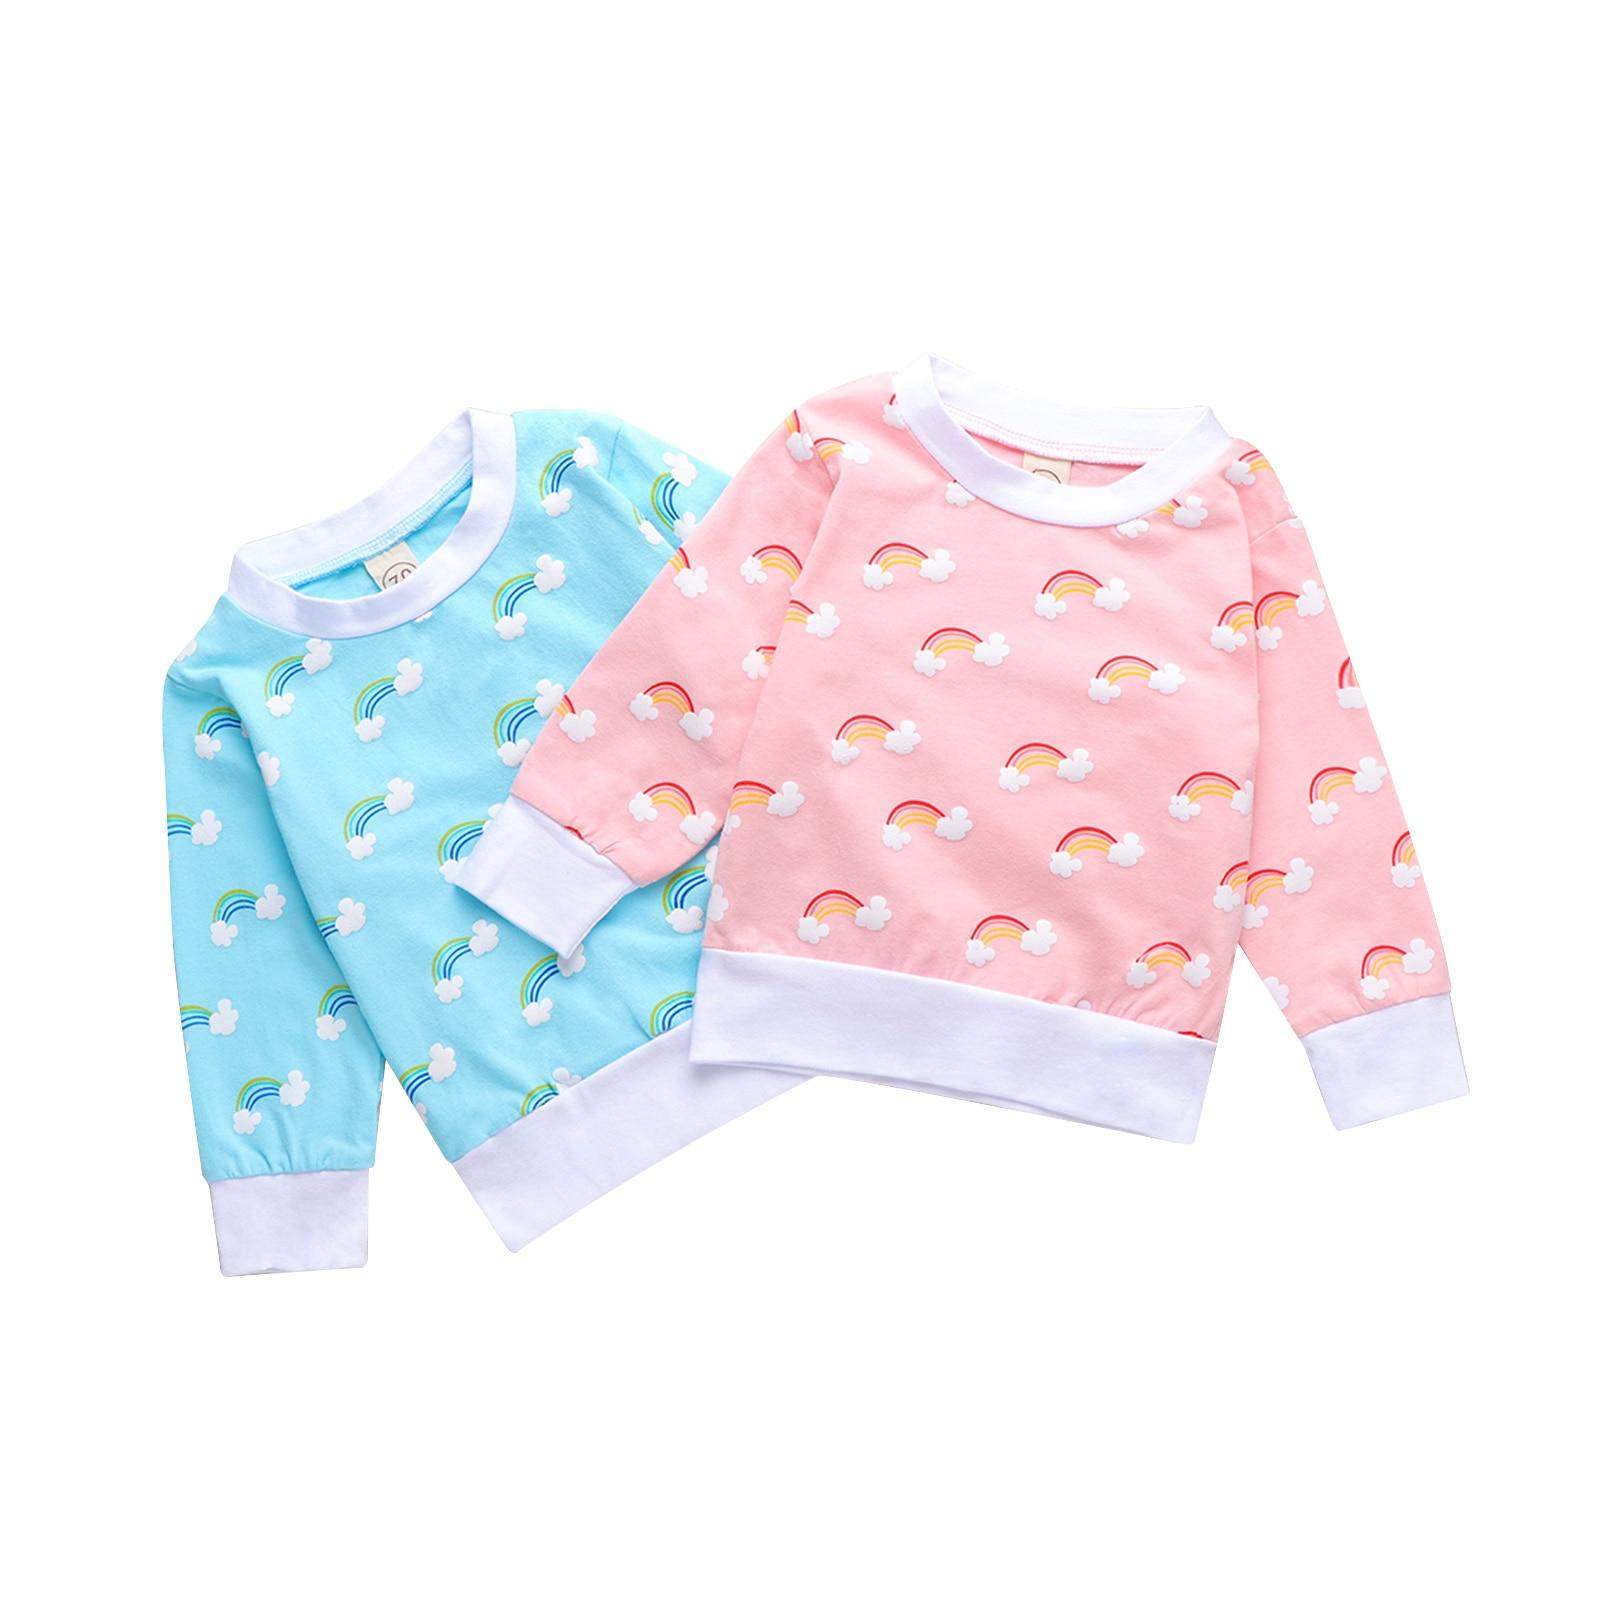 Newborn Baby Fashion Rainbow Print Top Casual Long Sleeve Top Kids Boys Girls 0-4T Hoodies Sweatshirts Spring Autumn Clothing